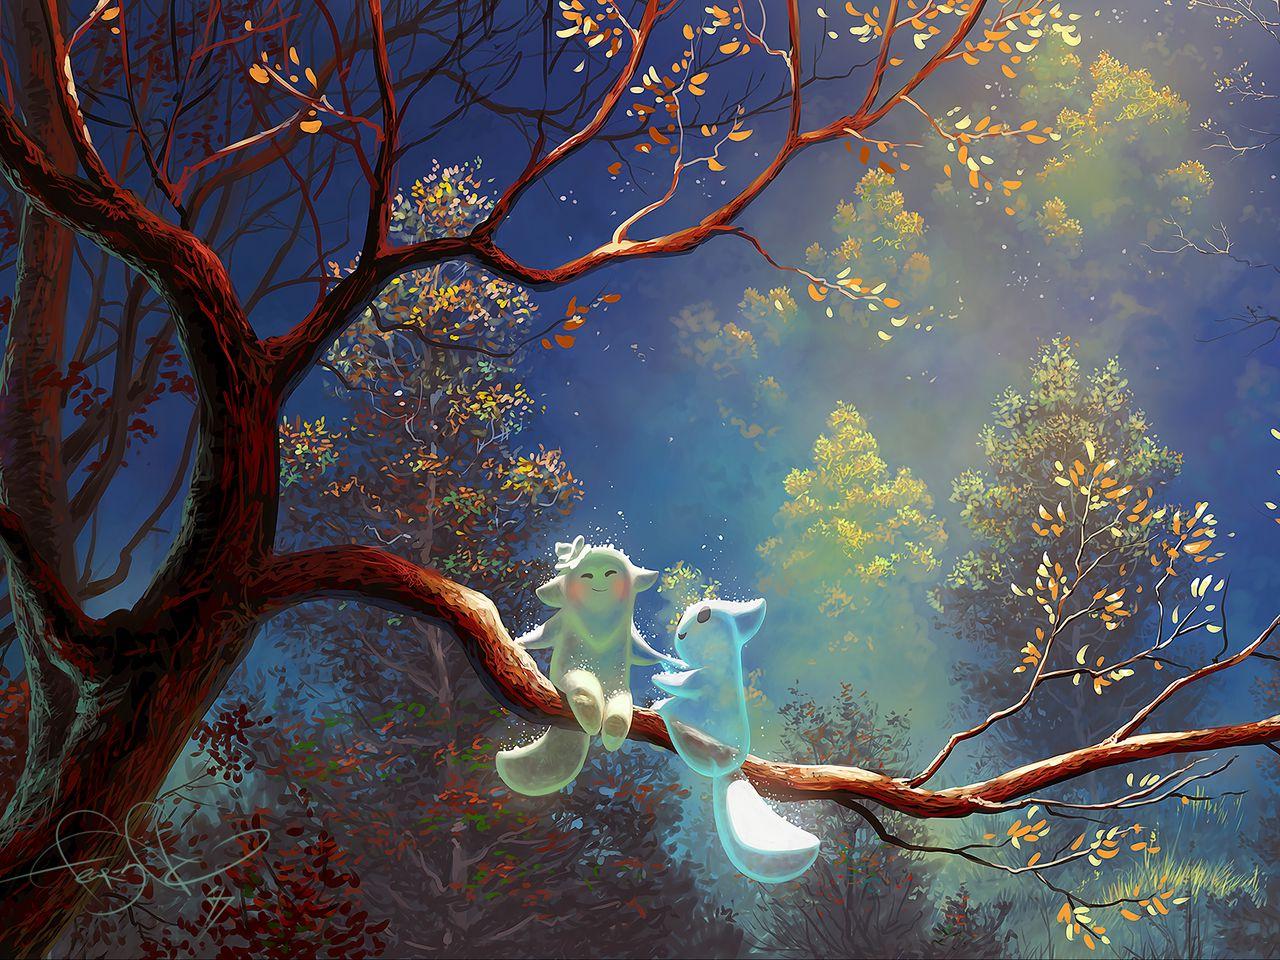 1280x960 Wallpaper animals, tree, branch, magic, art, fantasy